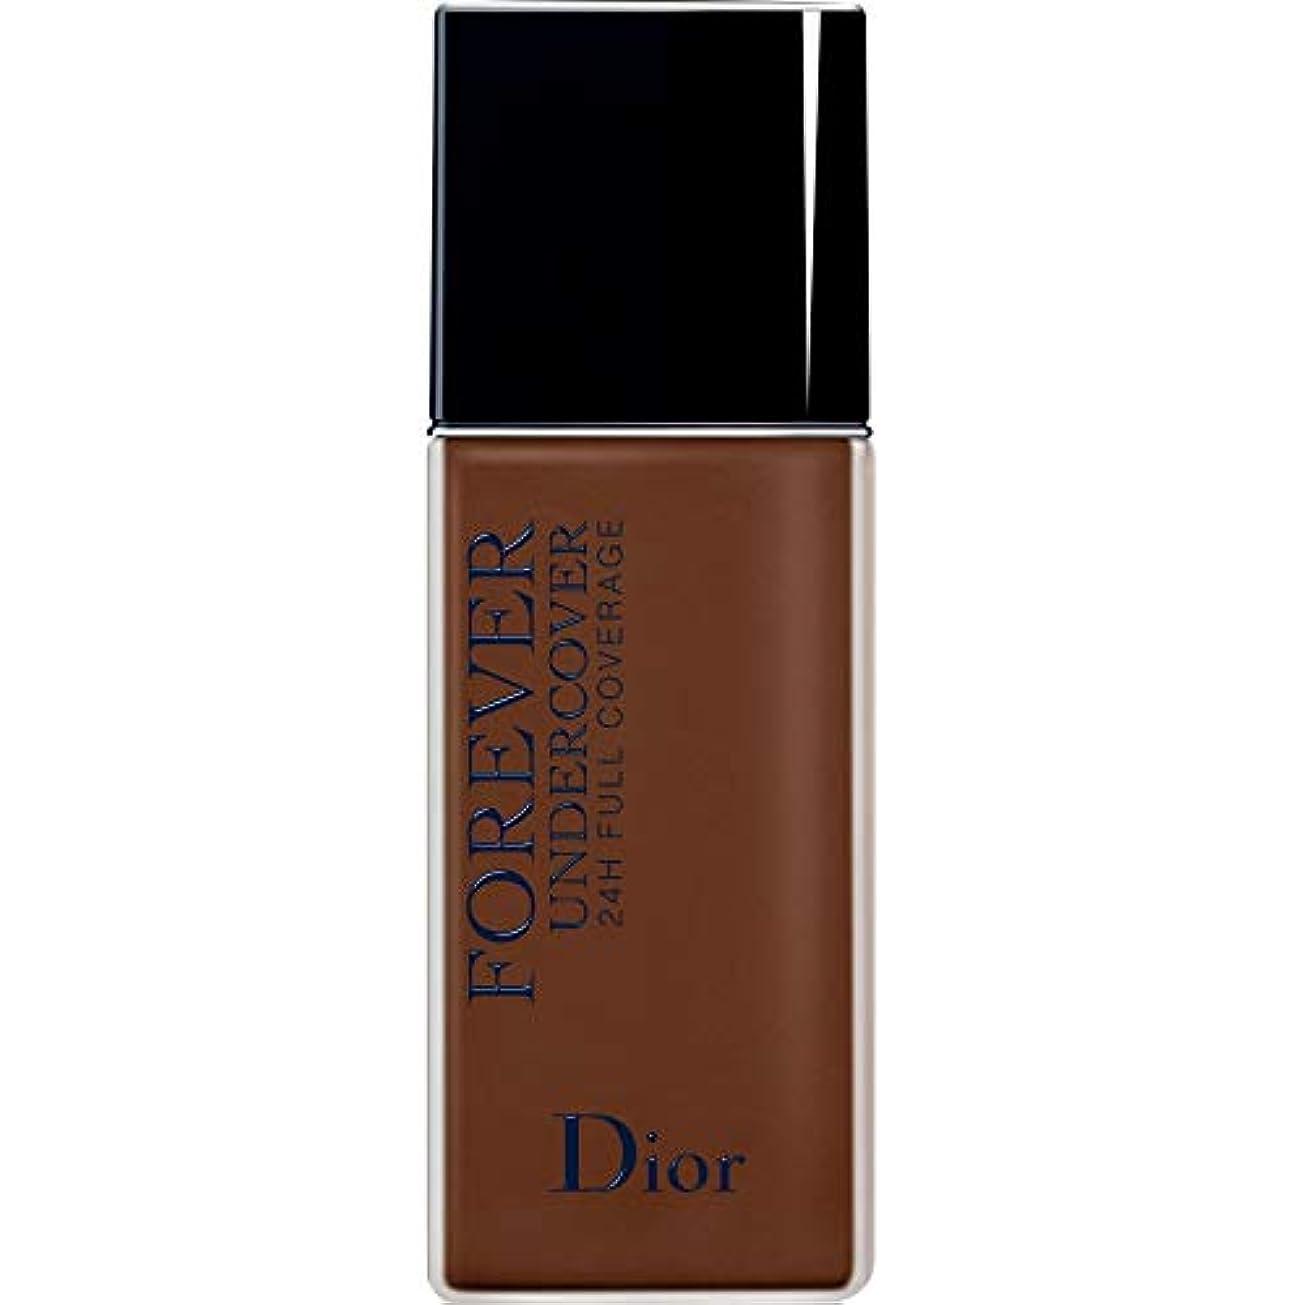 [Dior ] ディオールディオールスキン永遠アンダーカバーフルカバーの基礎40ミリリットル080 - 黒檀 - DIOR Diorskin Forever Undercover Full Coverage Foundation...